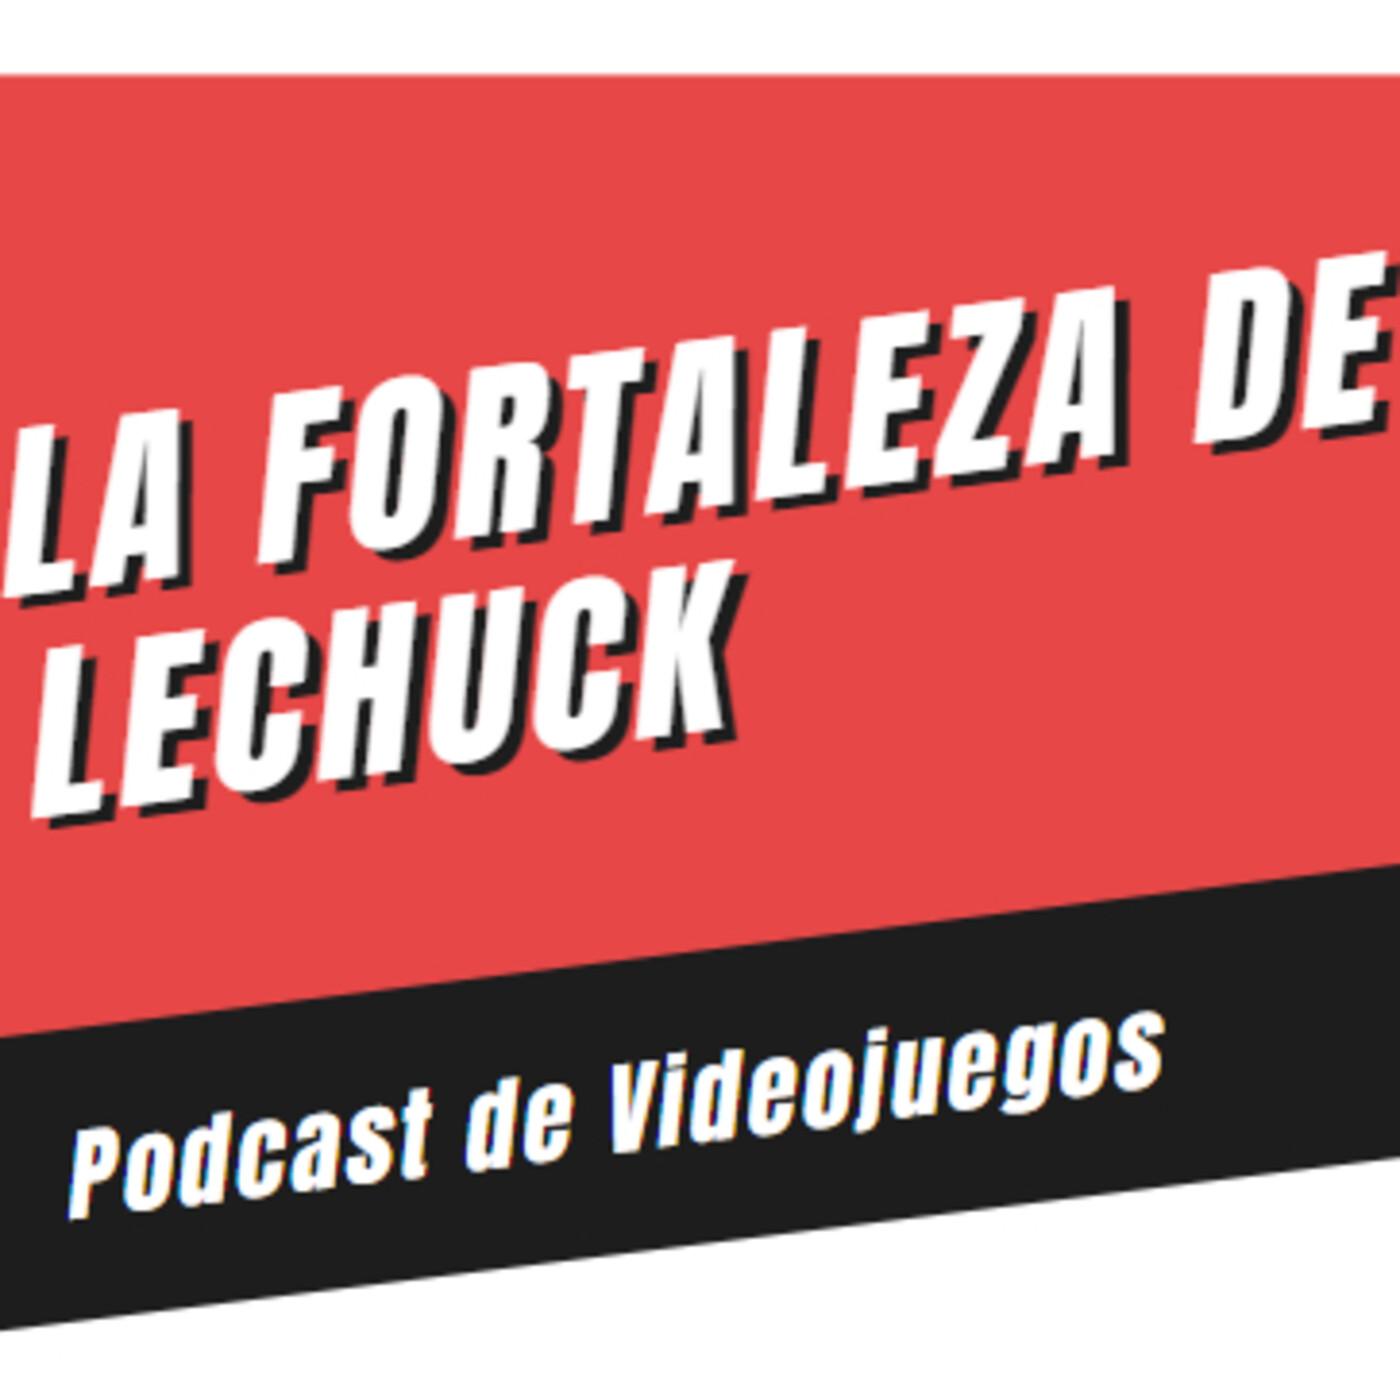 La Fortaleza de LeChuck